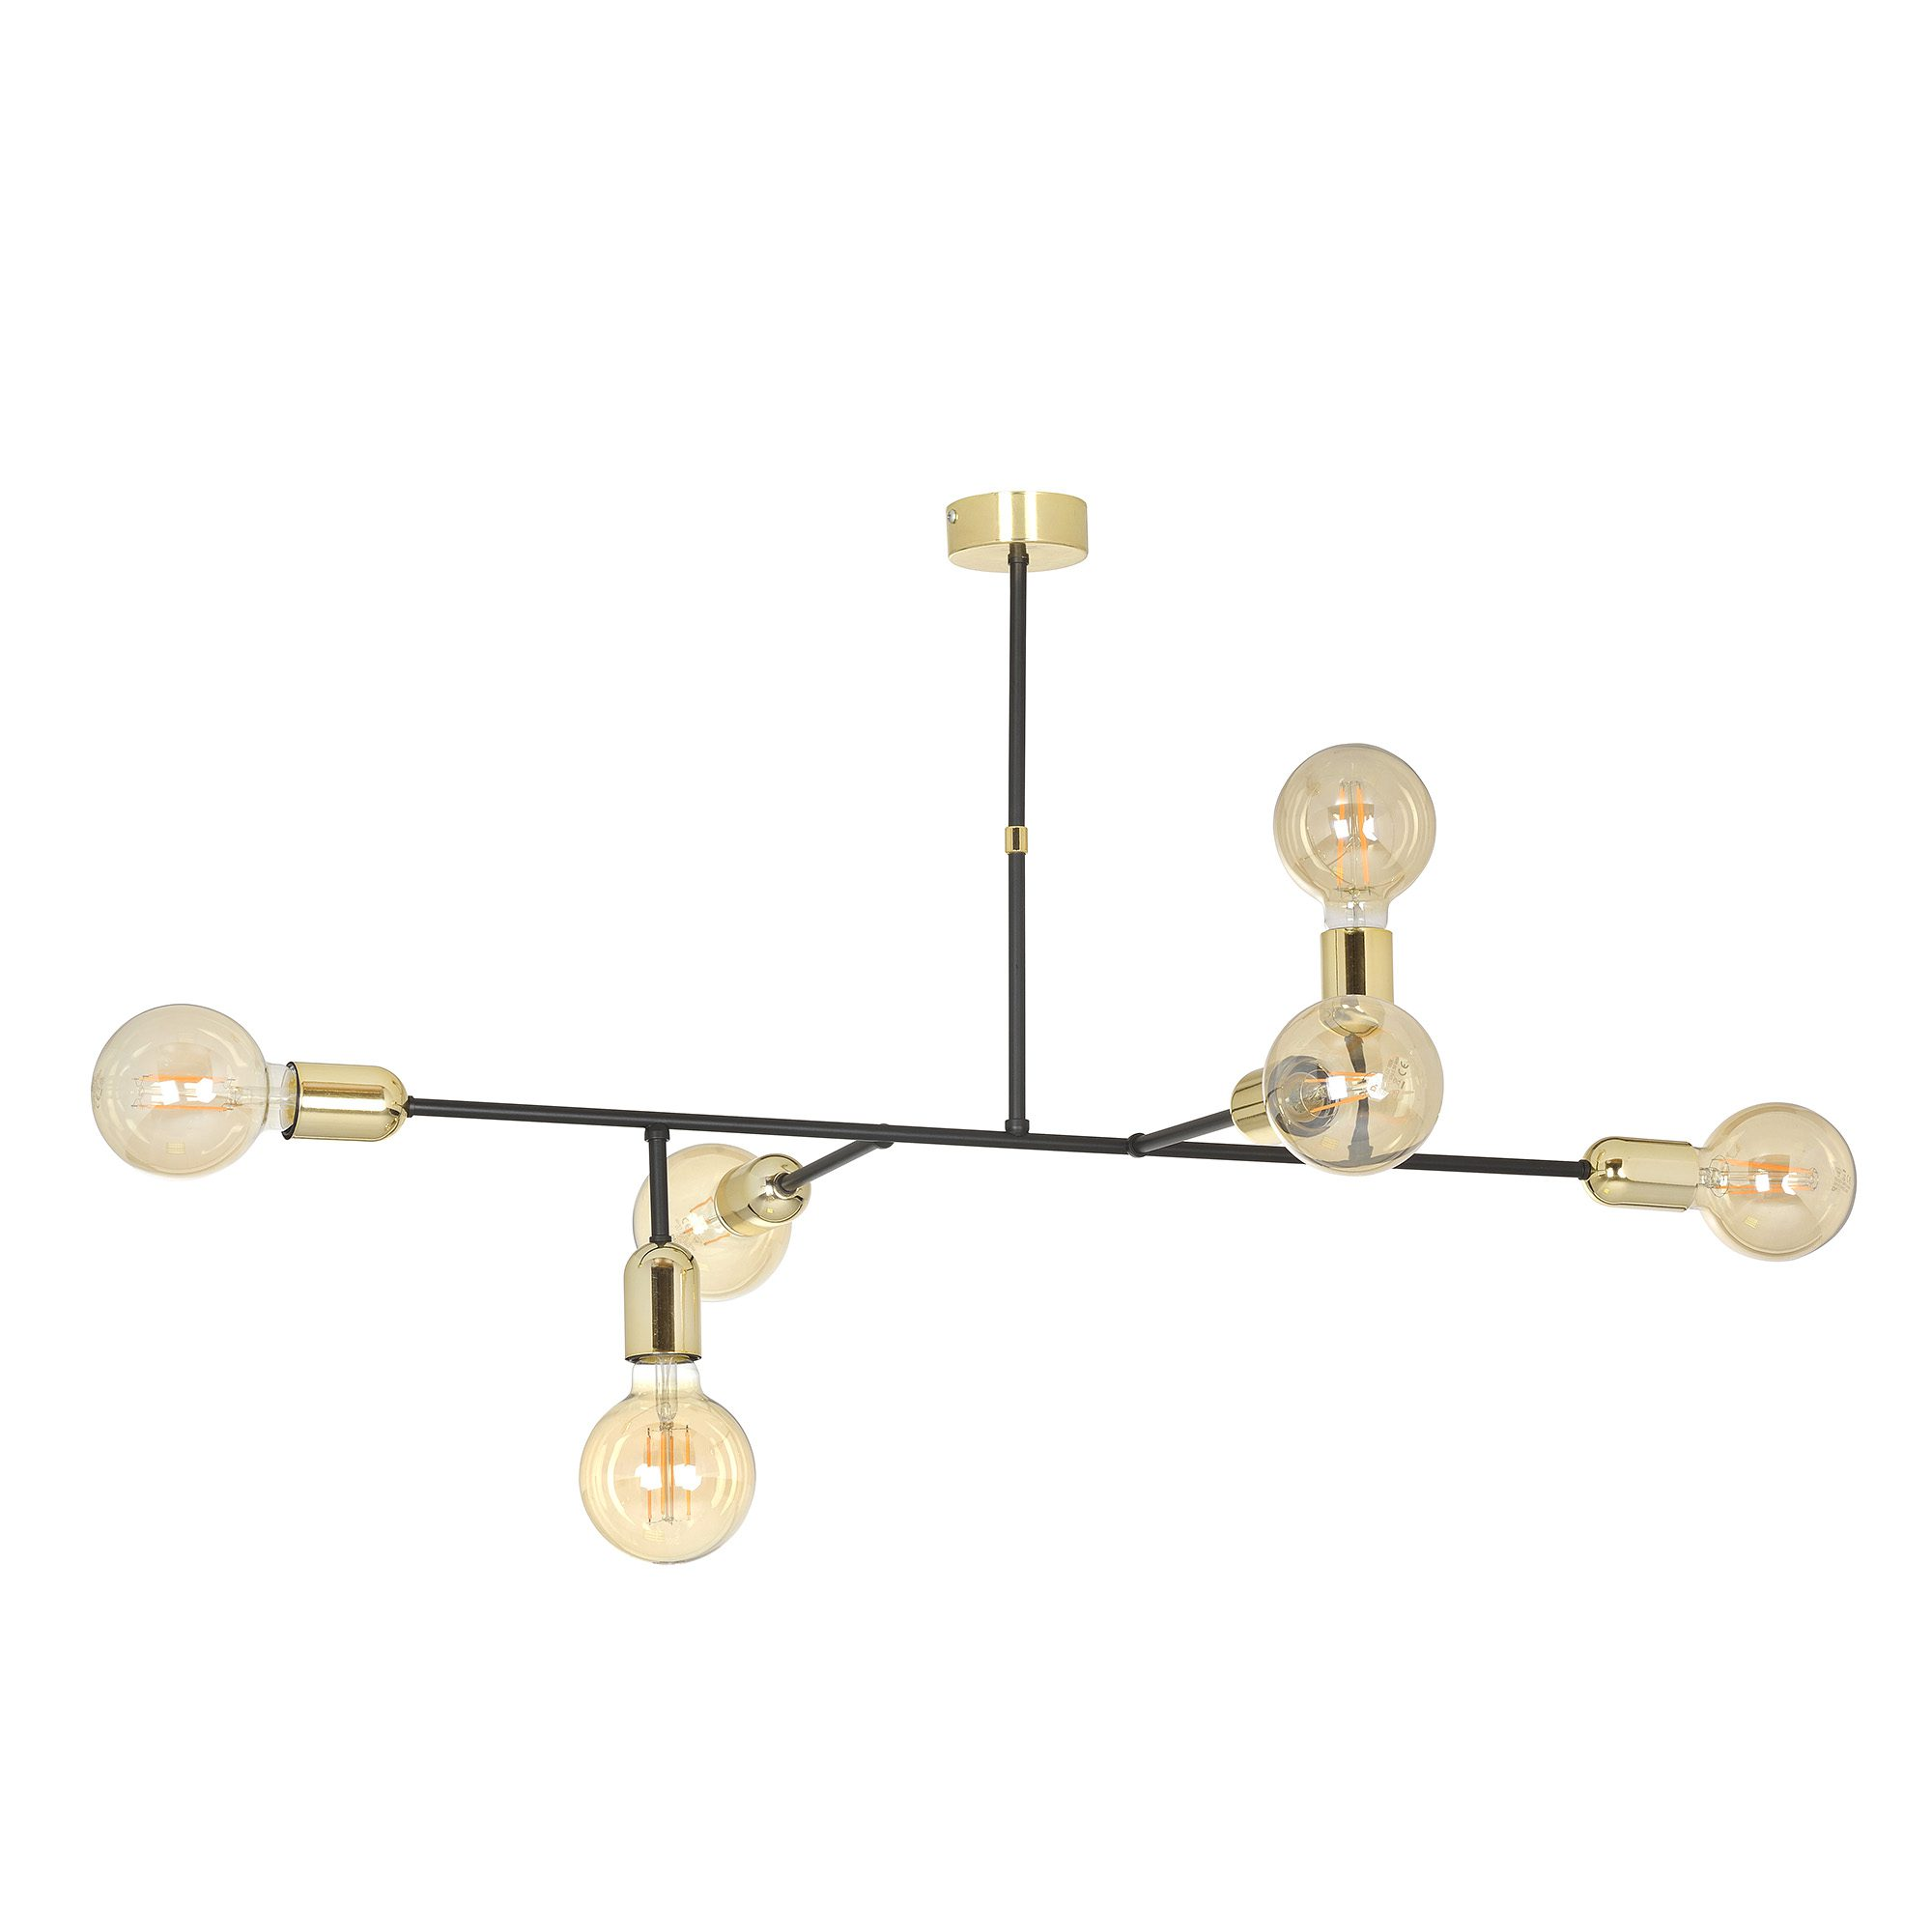 designerska-lampa-sufitowa-loft-industrialna